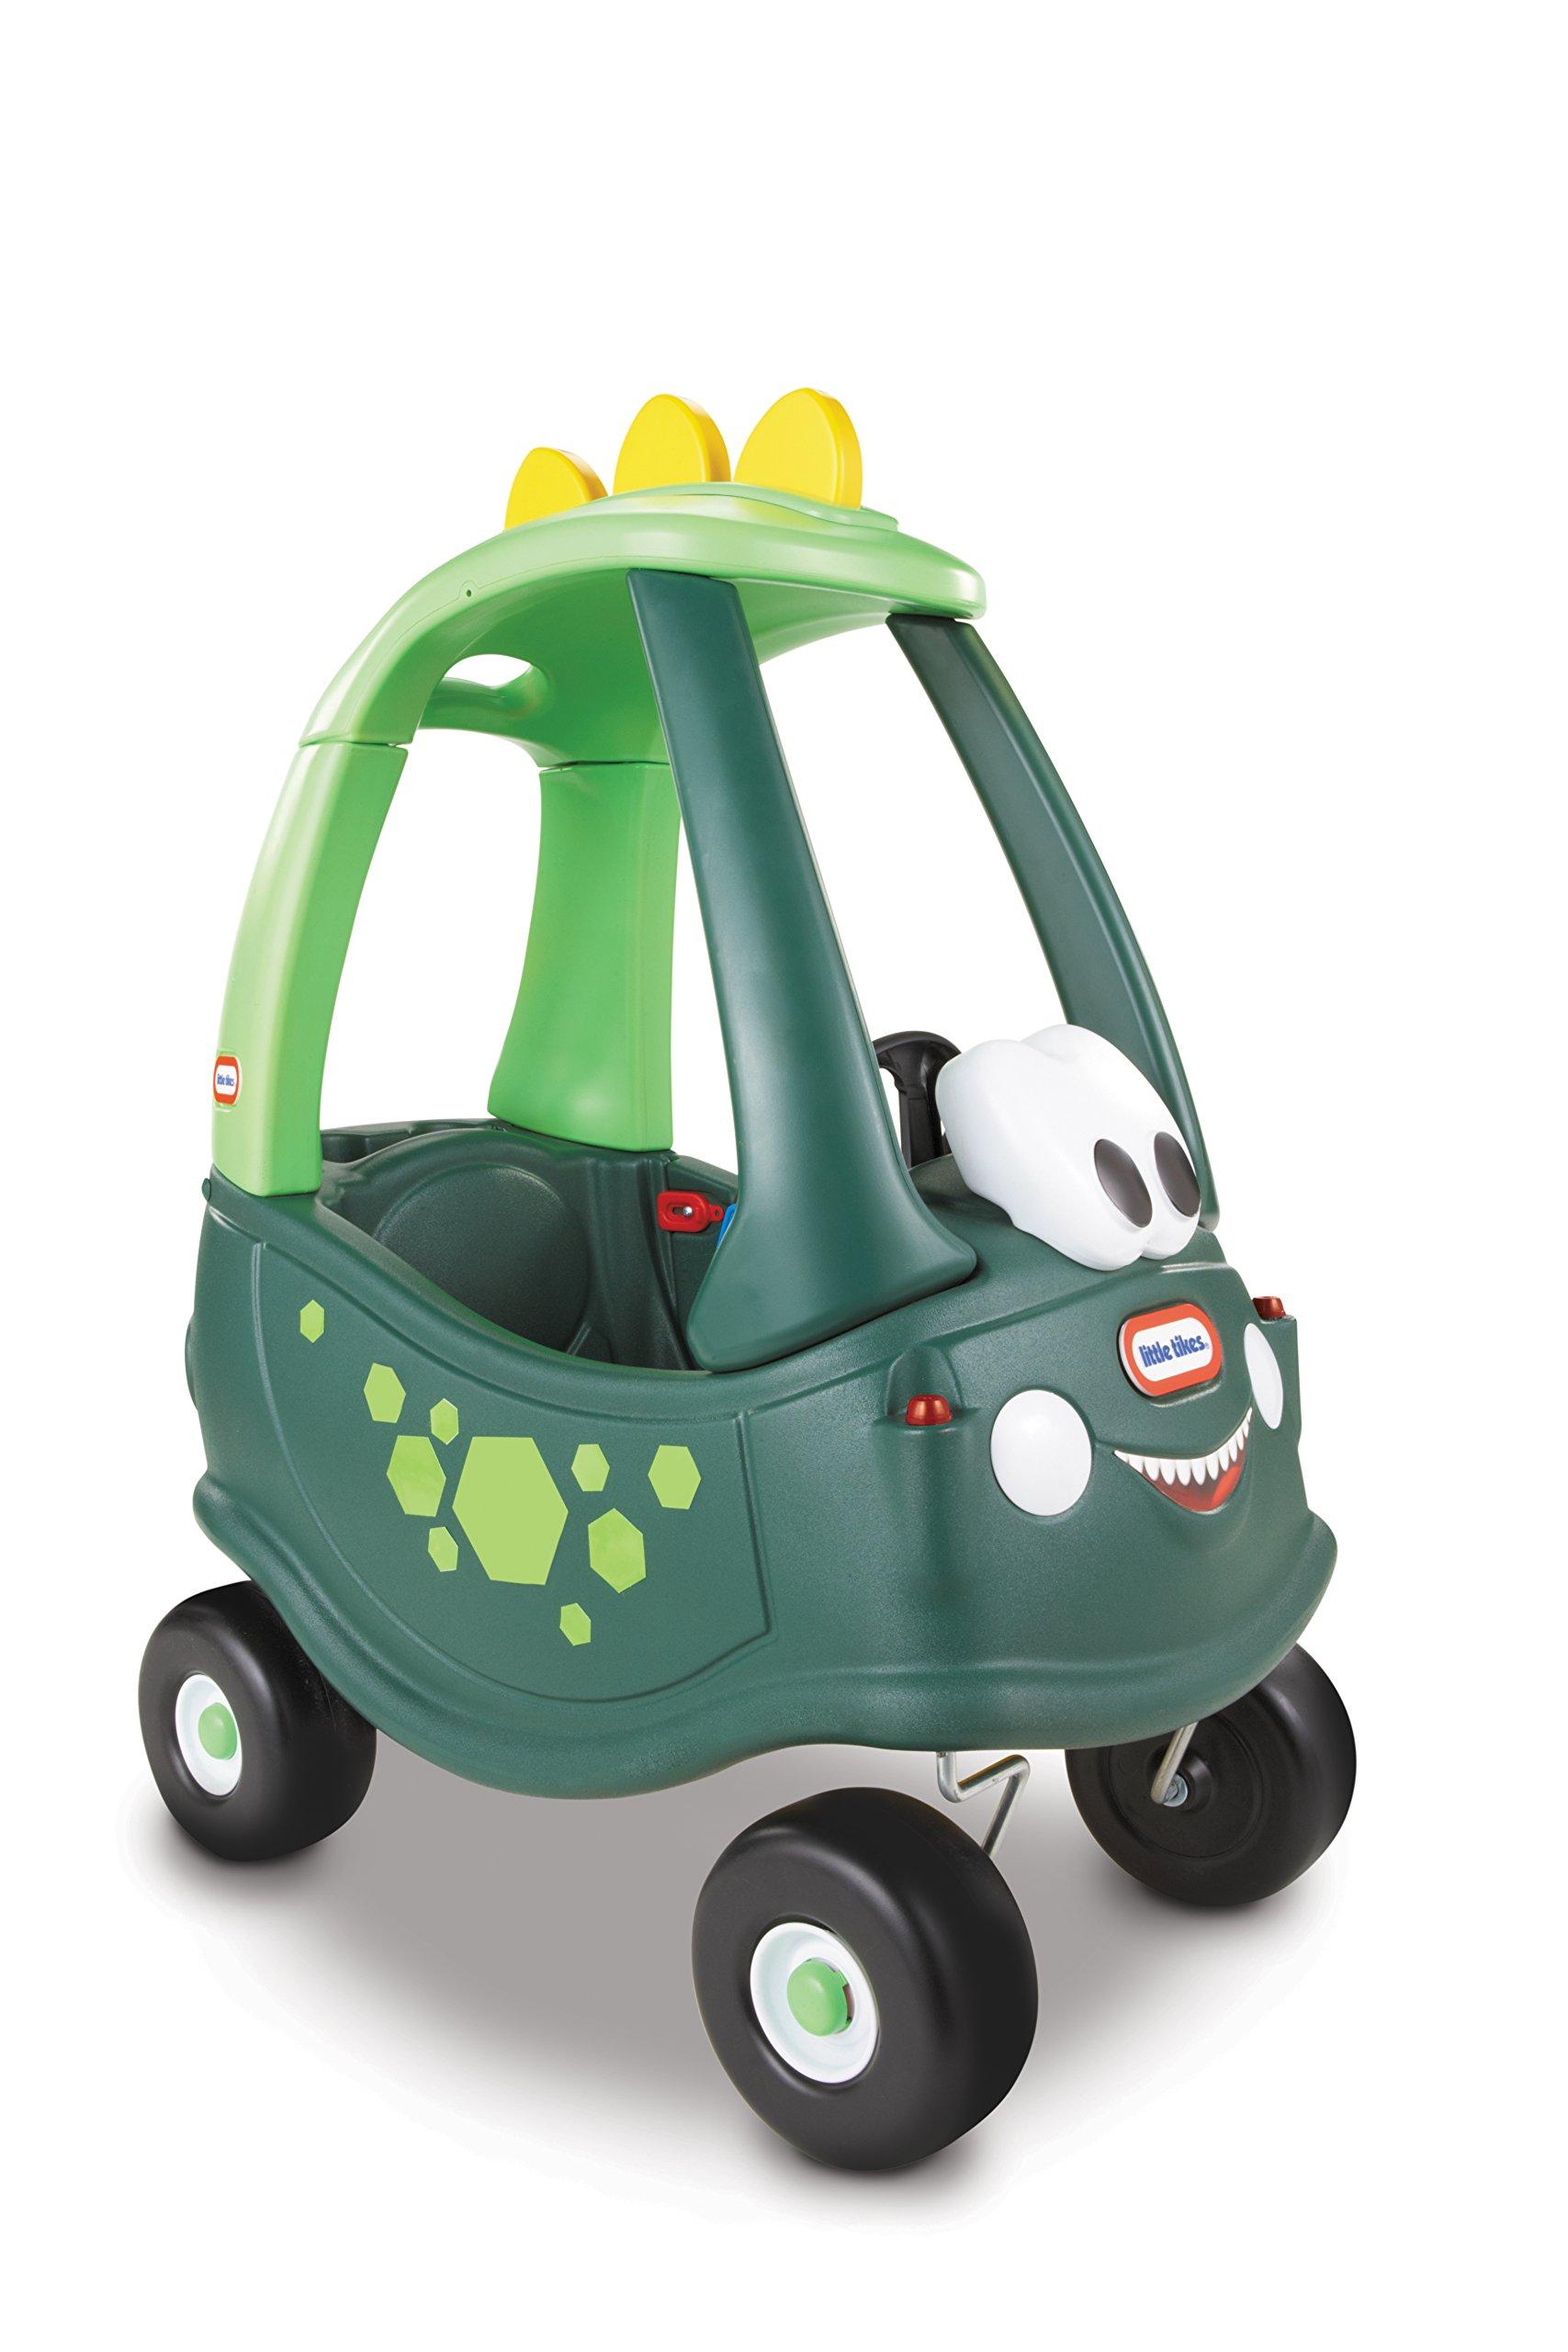 Little Tikes Cozy Coupe Dino - Amazon Exclusive by Little Tikes